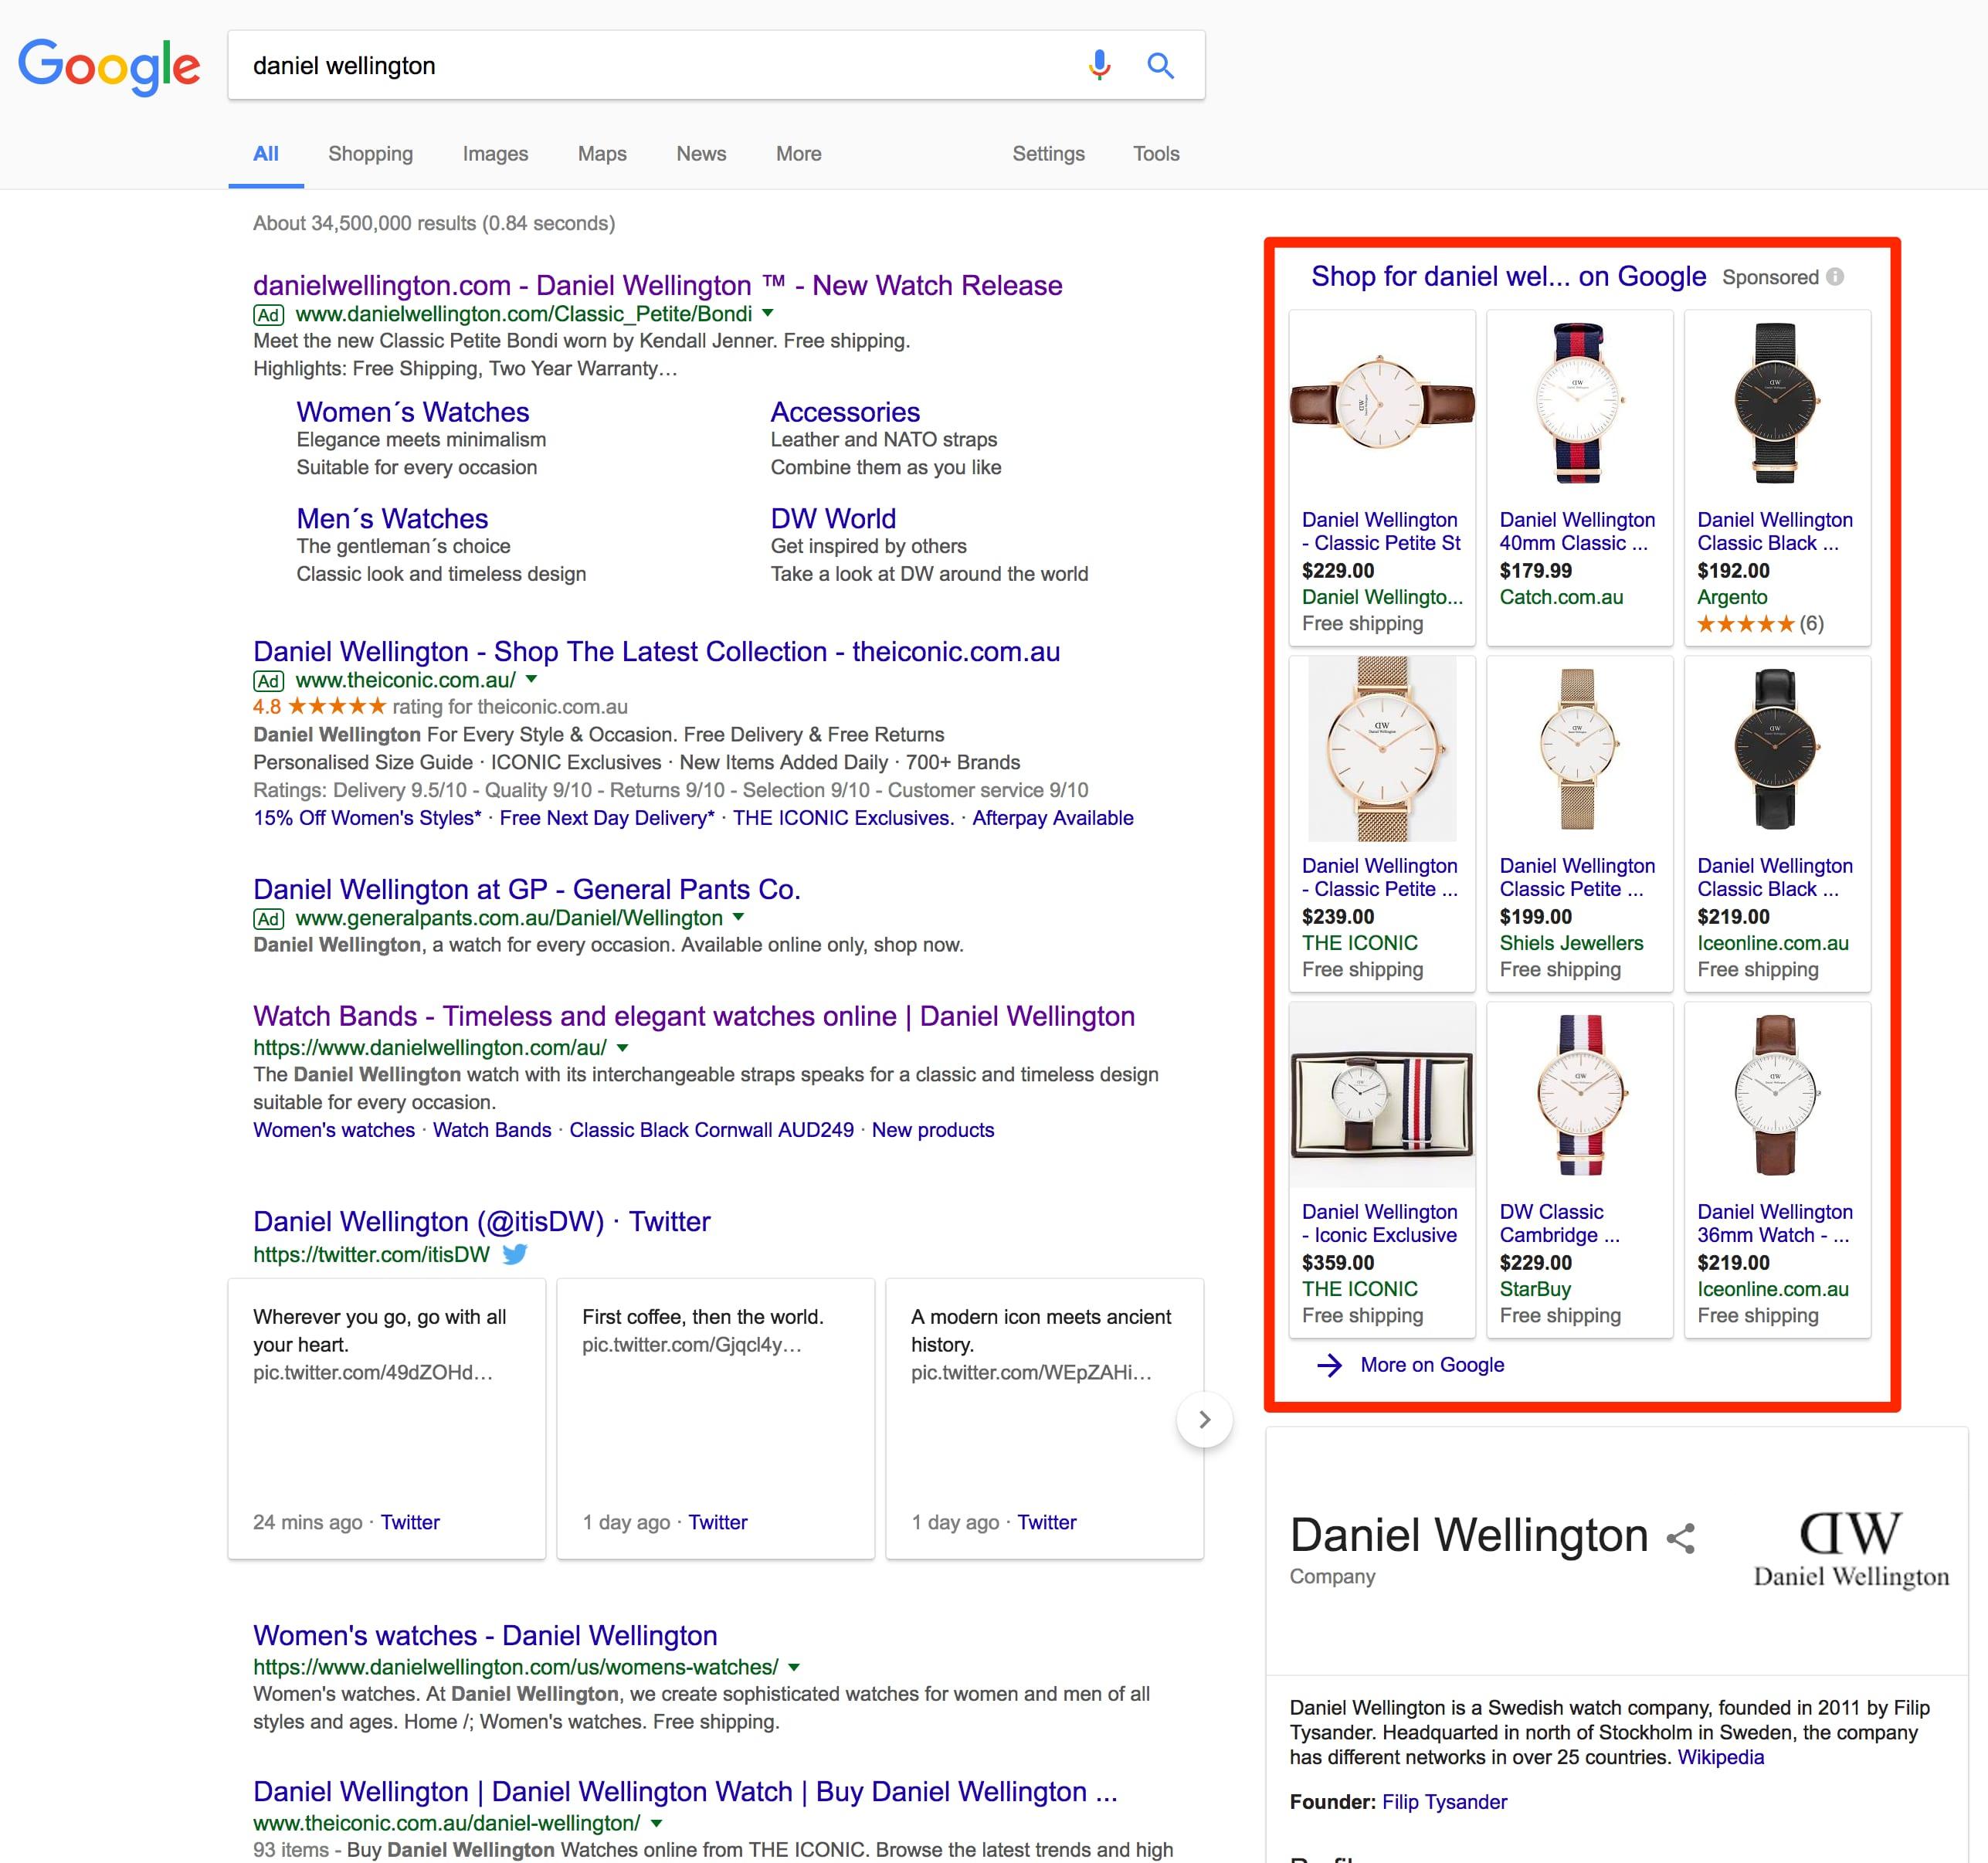 Daniel Wellington Google Shopping